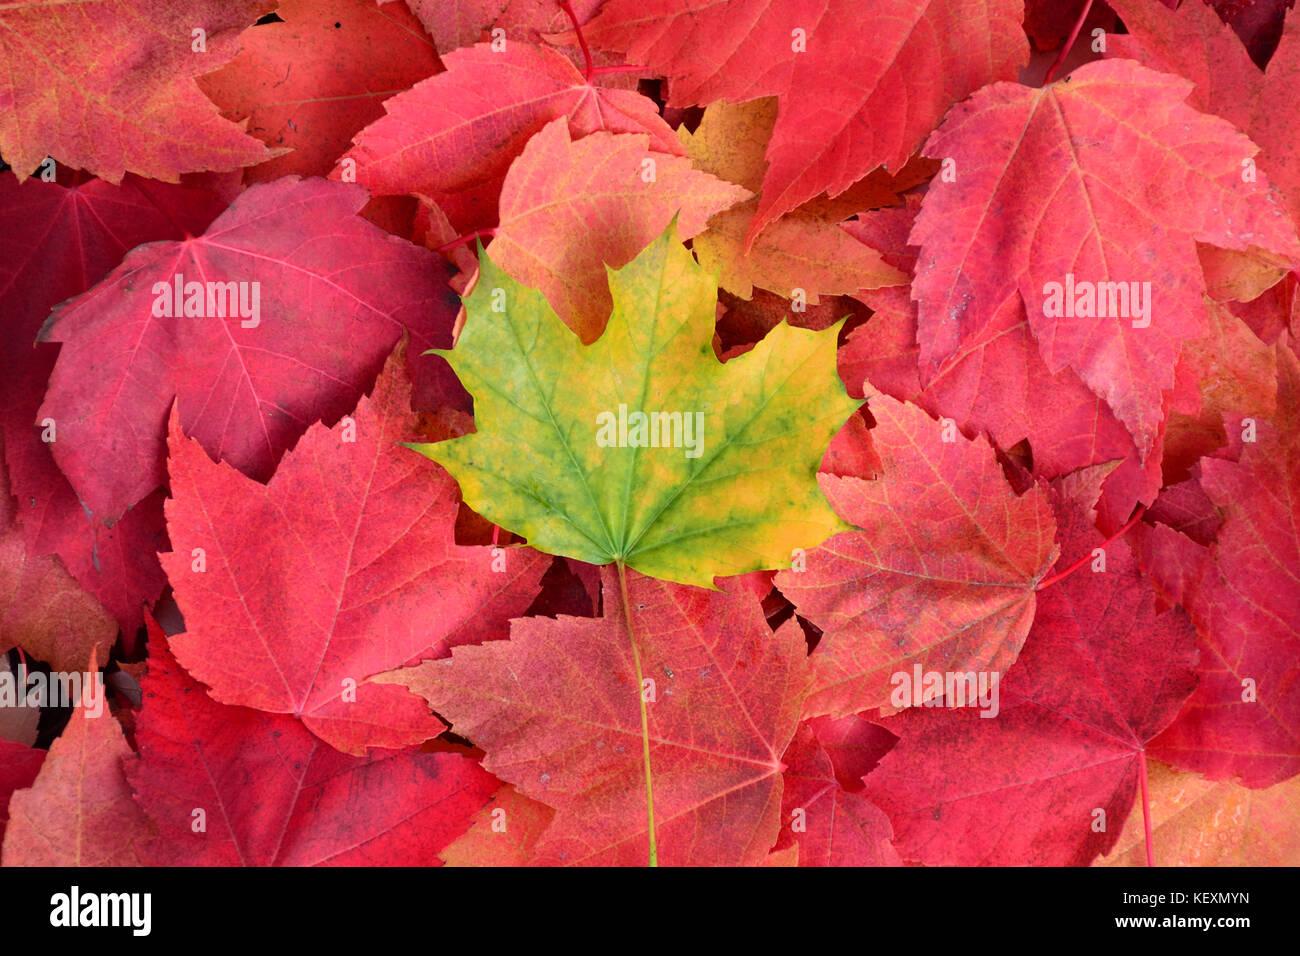 Seasons autumn fall season seasons greetings stock photos seasons premature fall stock image m4hsunfo